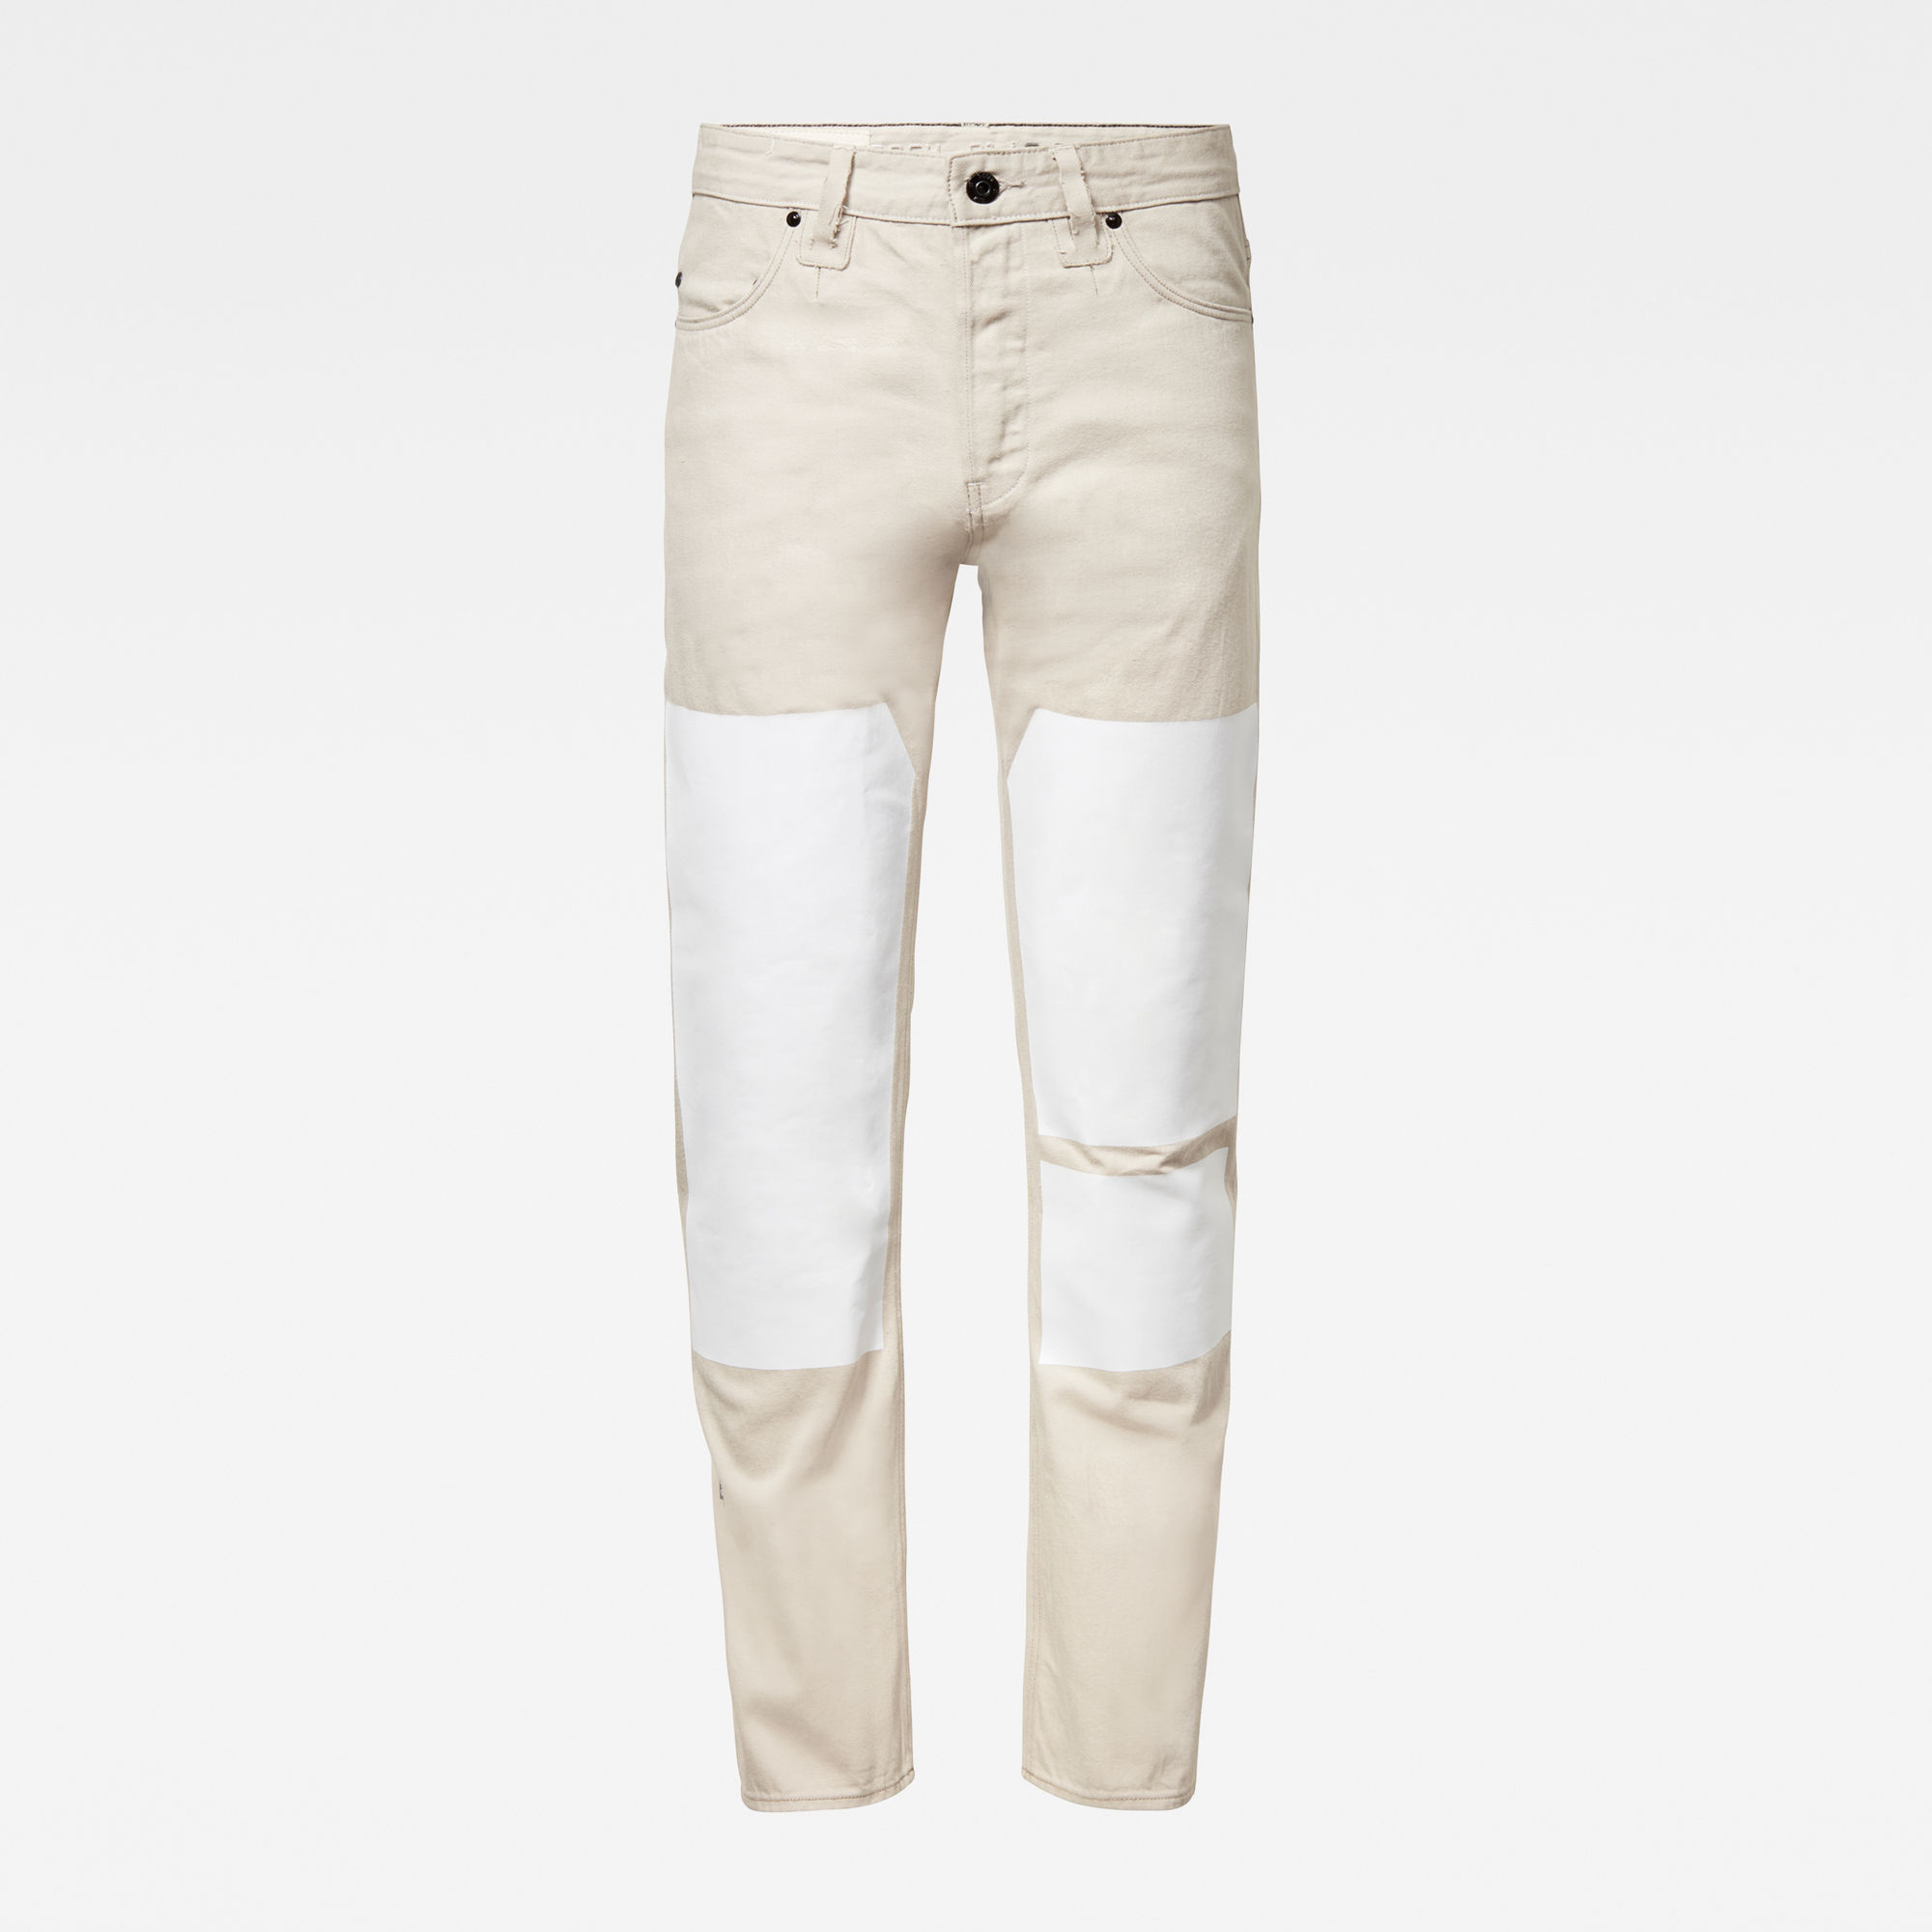 G-Star RAW Heren GSRR Triple A Straight Selvedge Jeans Grijs